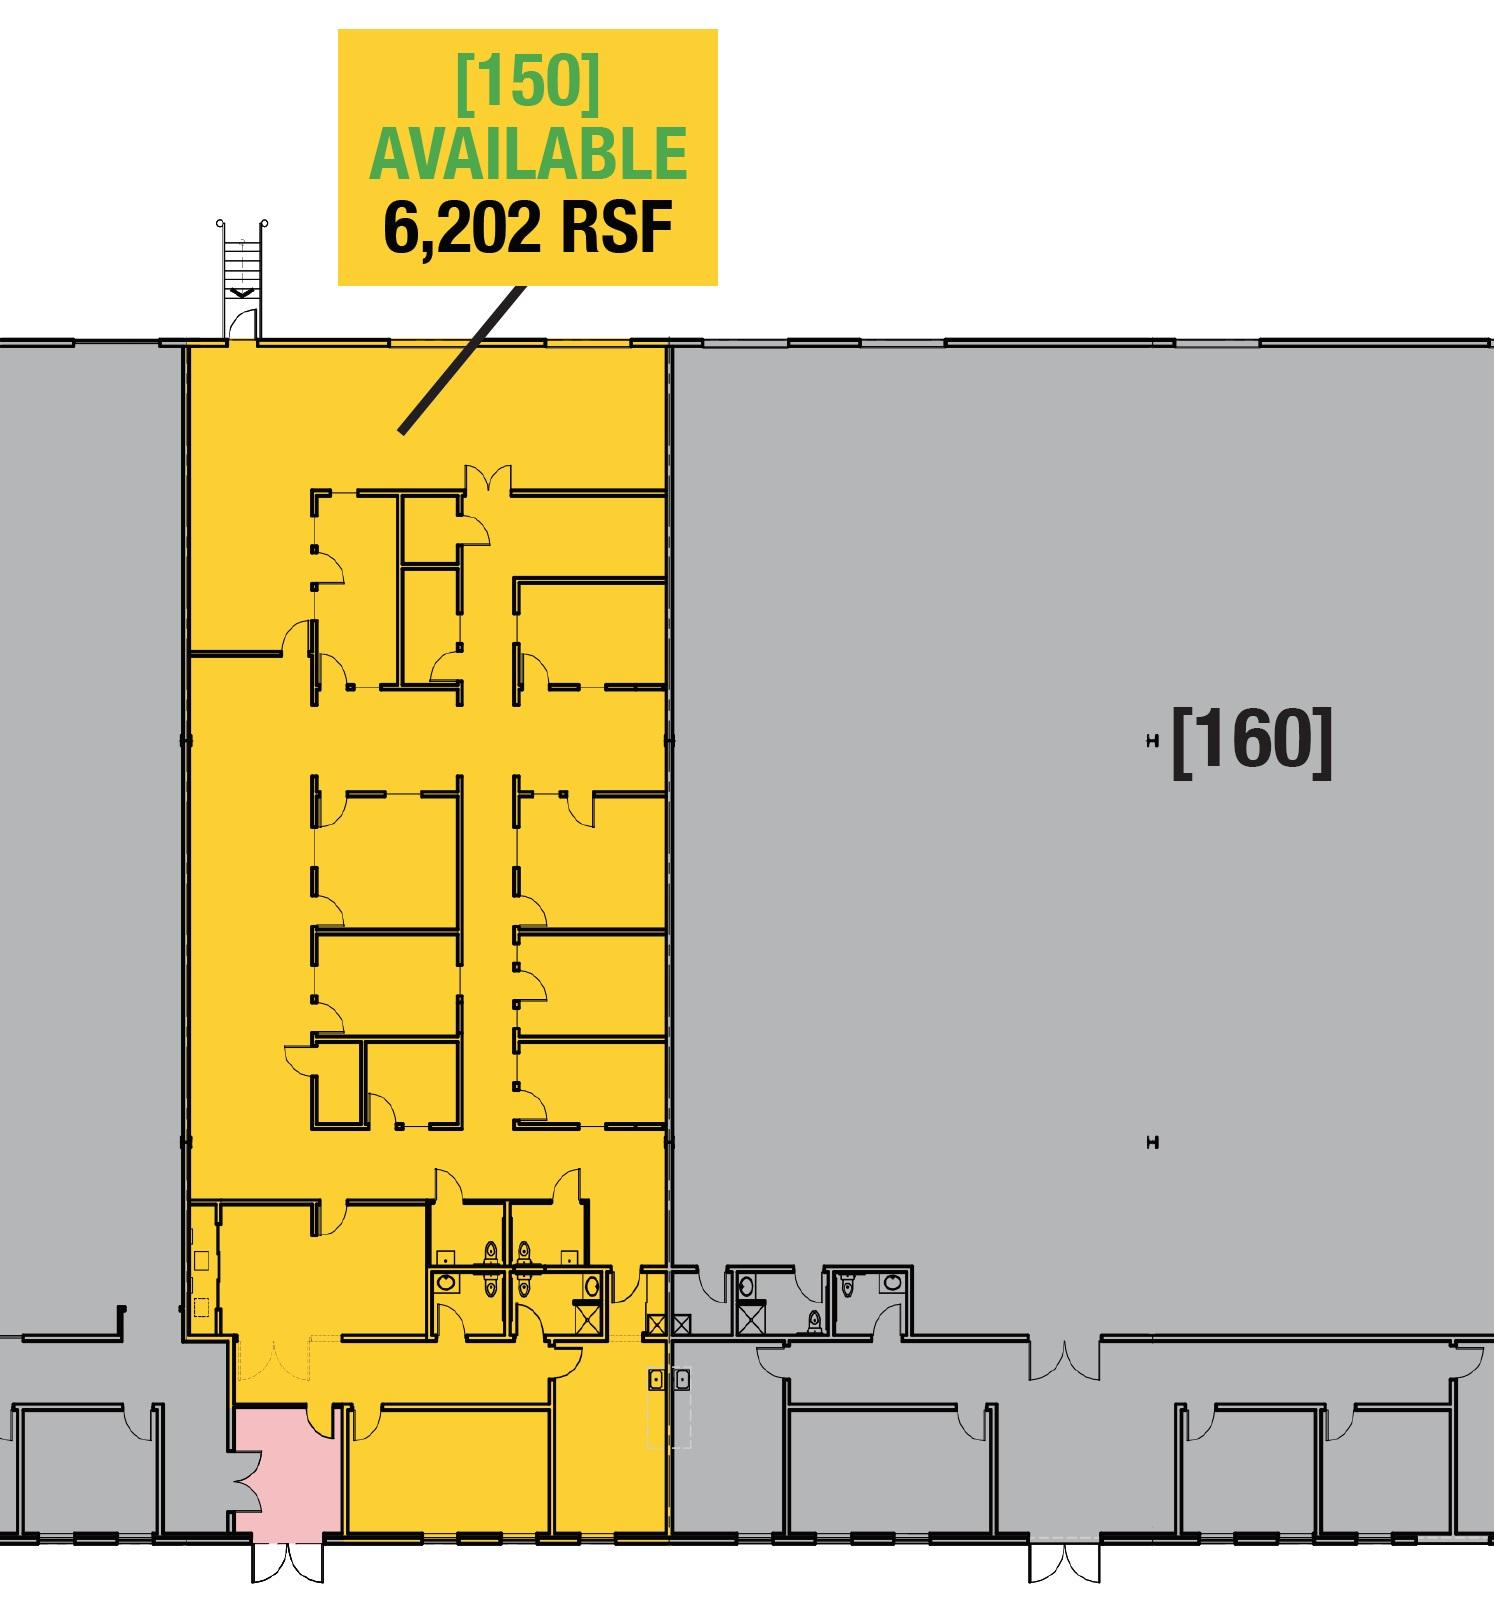 SUITE 150 - 6,202 RSF